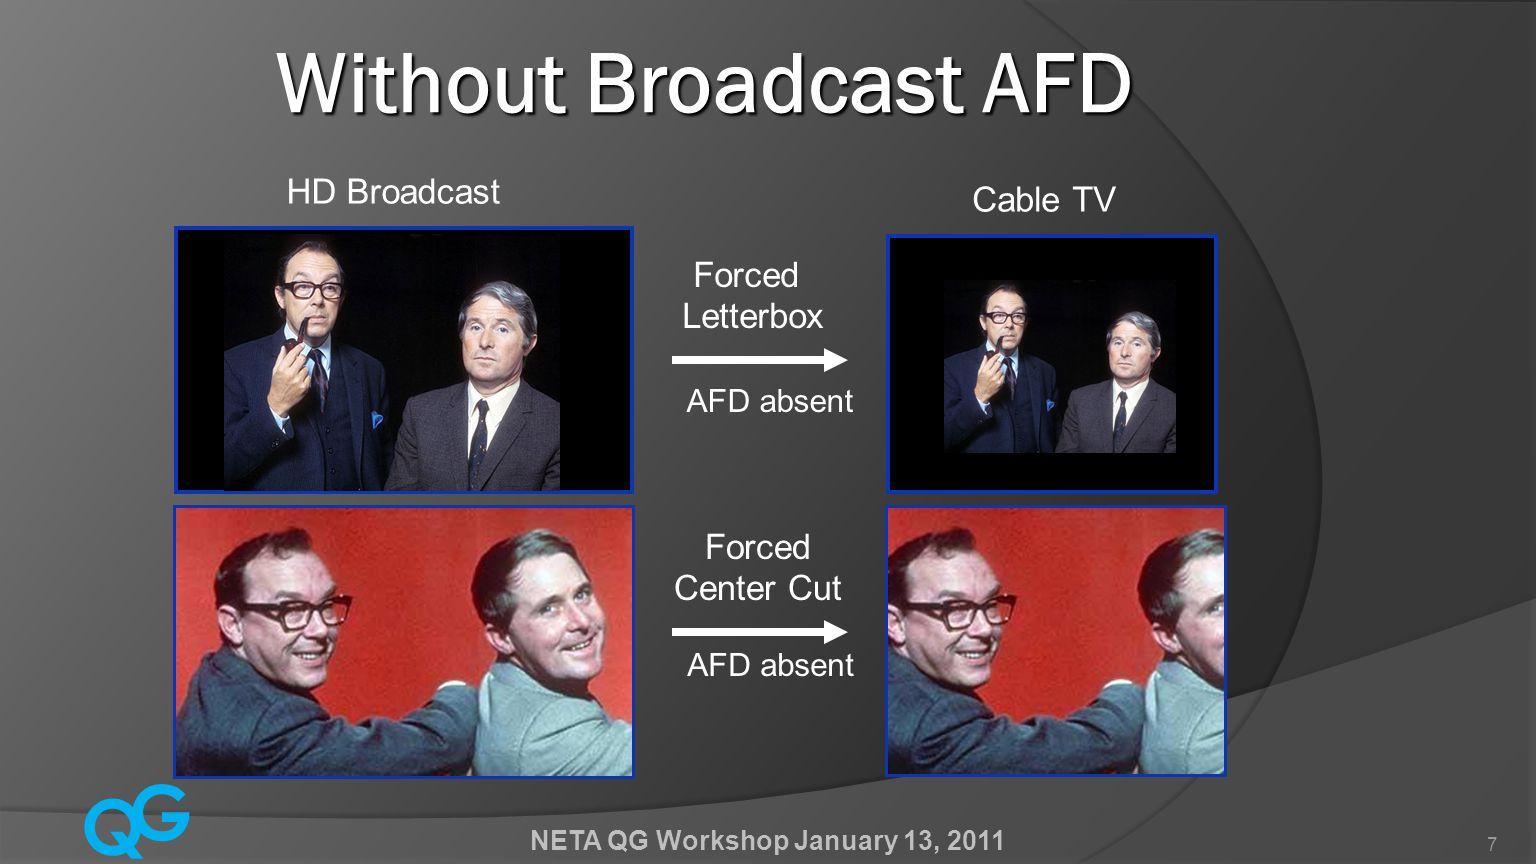 Q G NETA QG Workshop January 13, 2011 18 WSIU - HD AFD  Satellite receiver provides HD AFD from PBS.